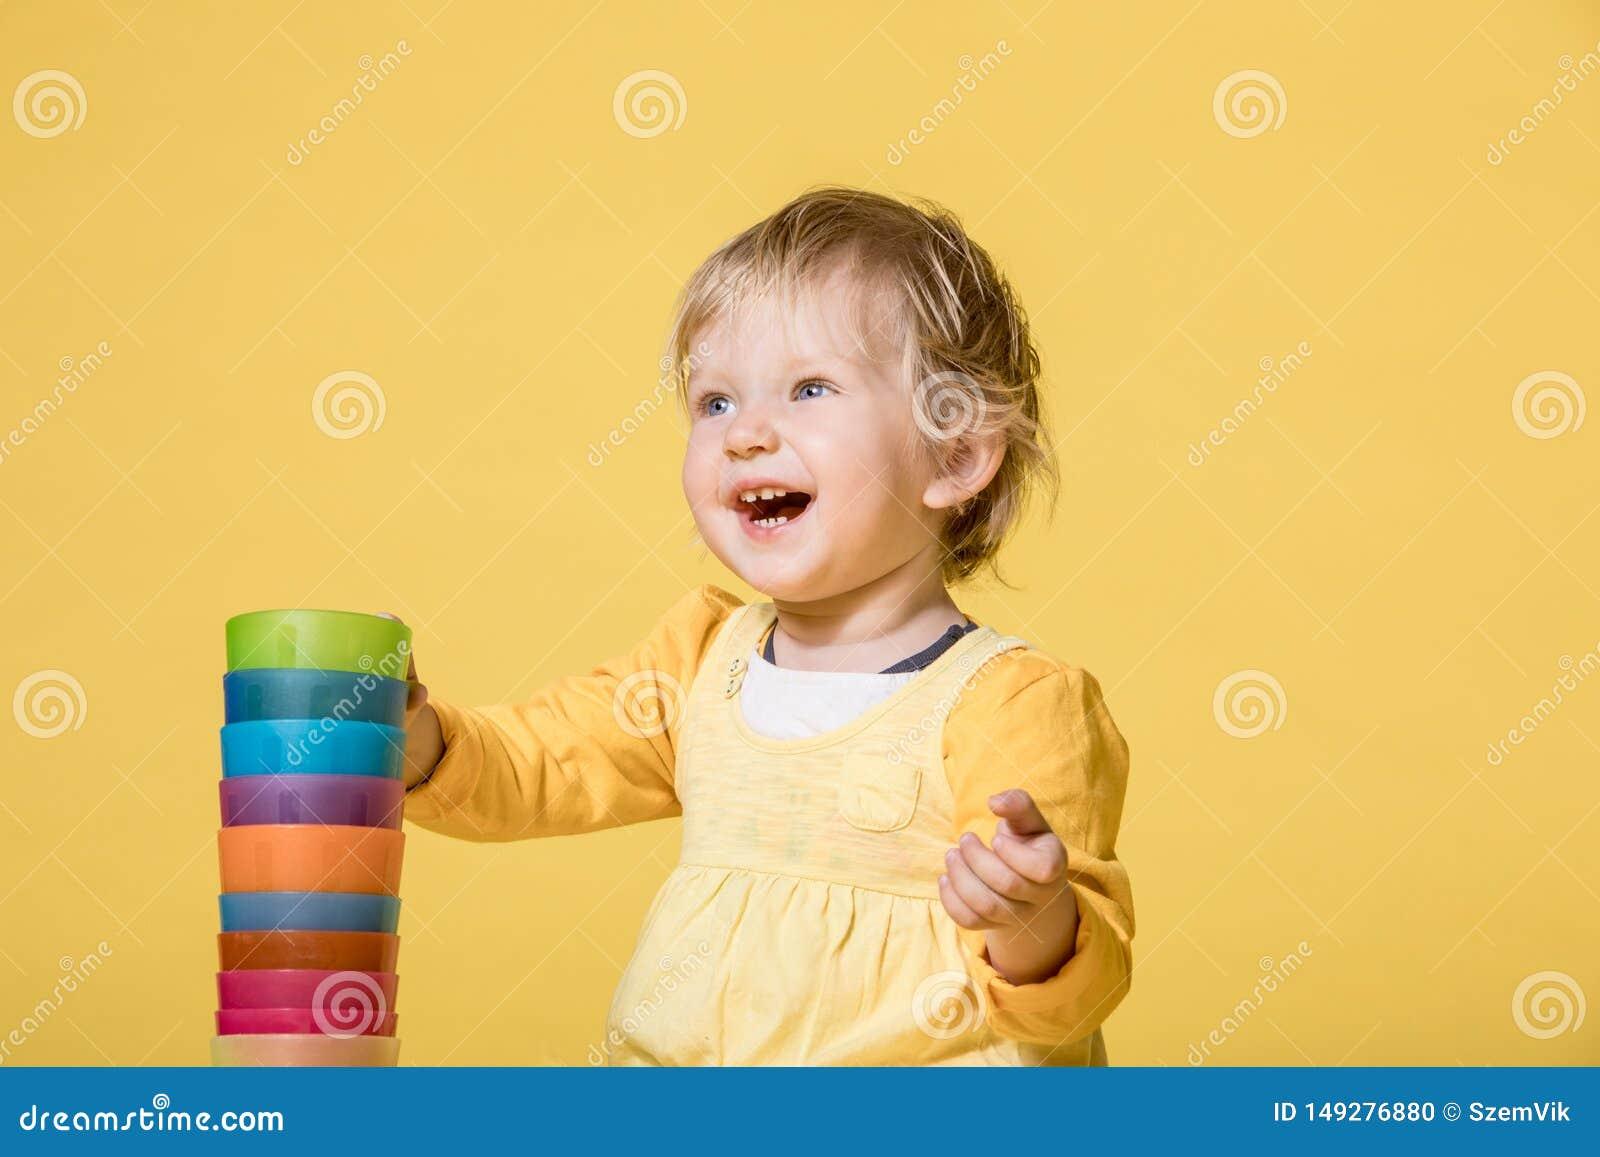 Молодой ребенок в желтом платье на желтой предпосылке